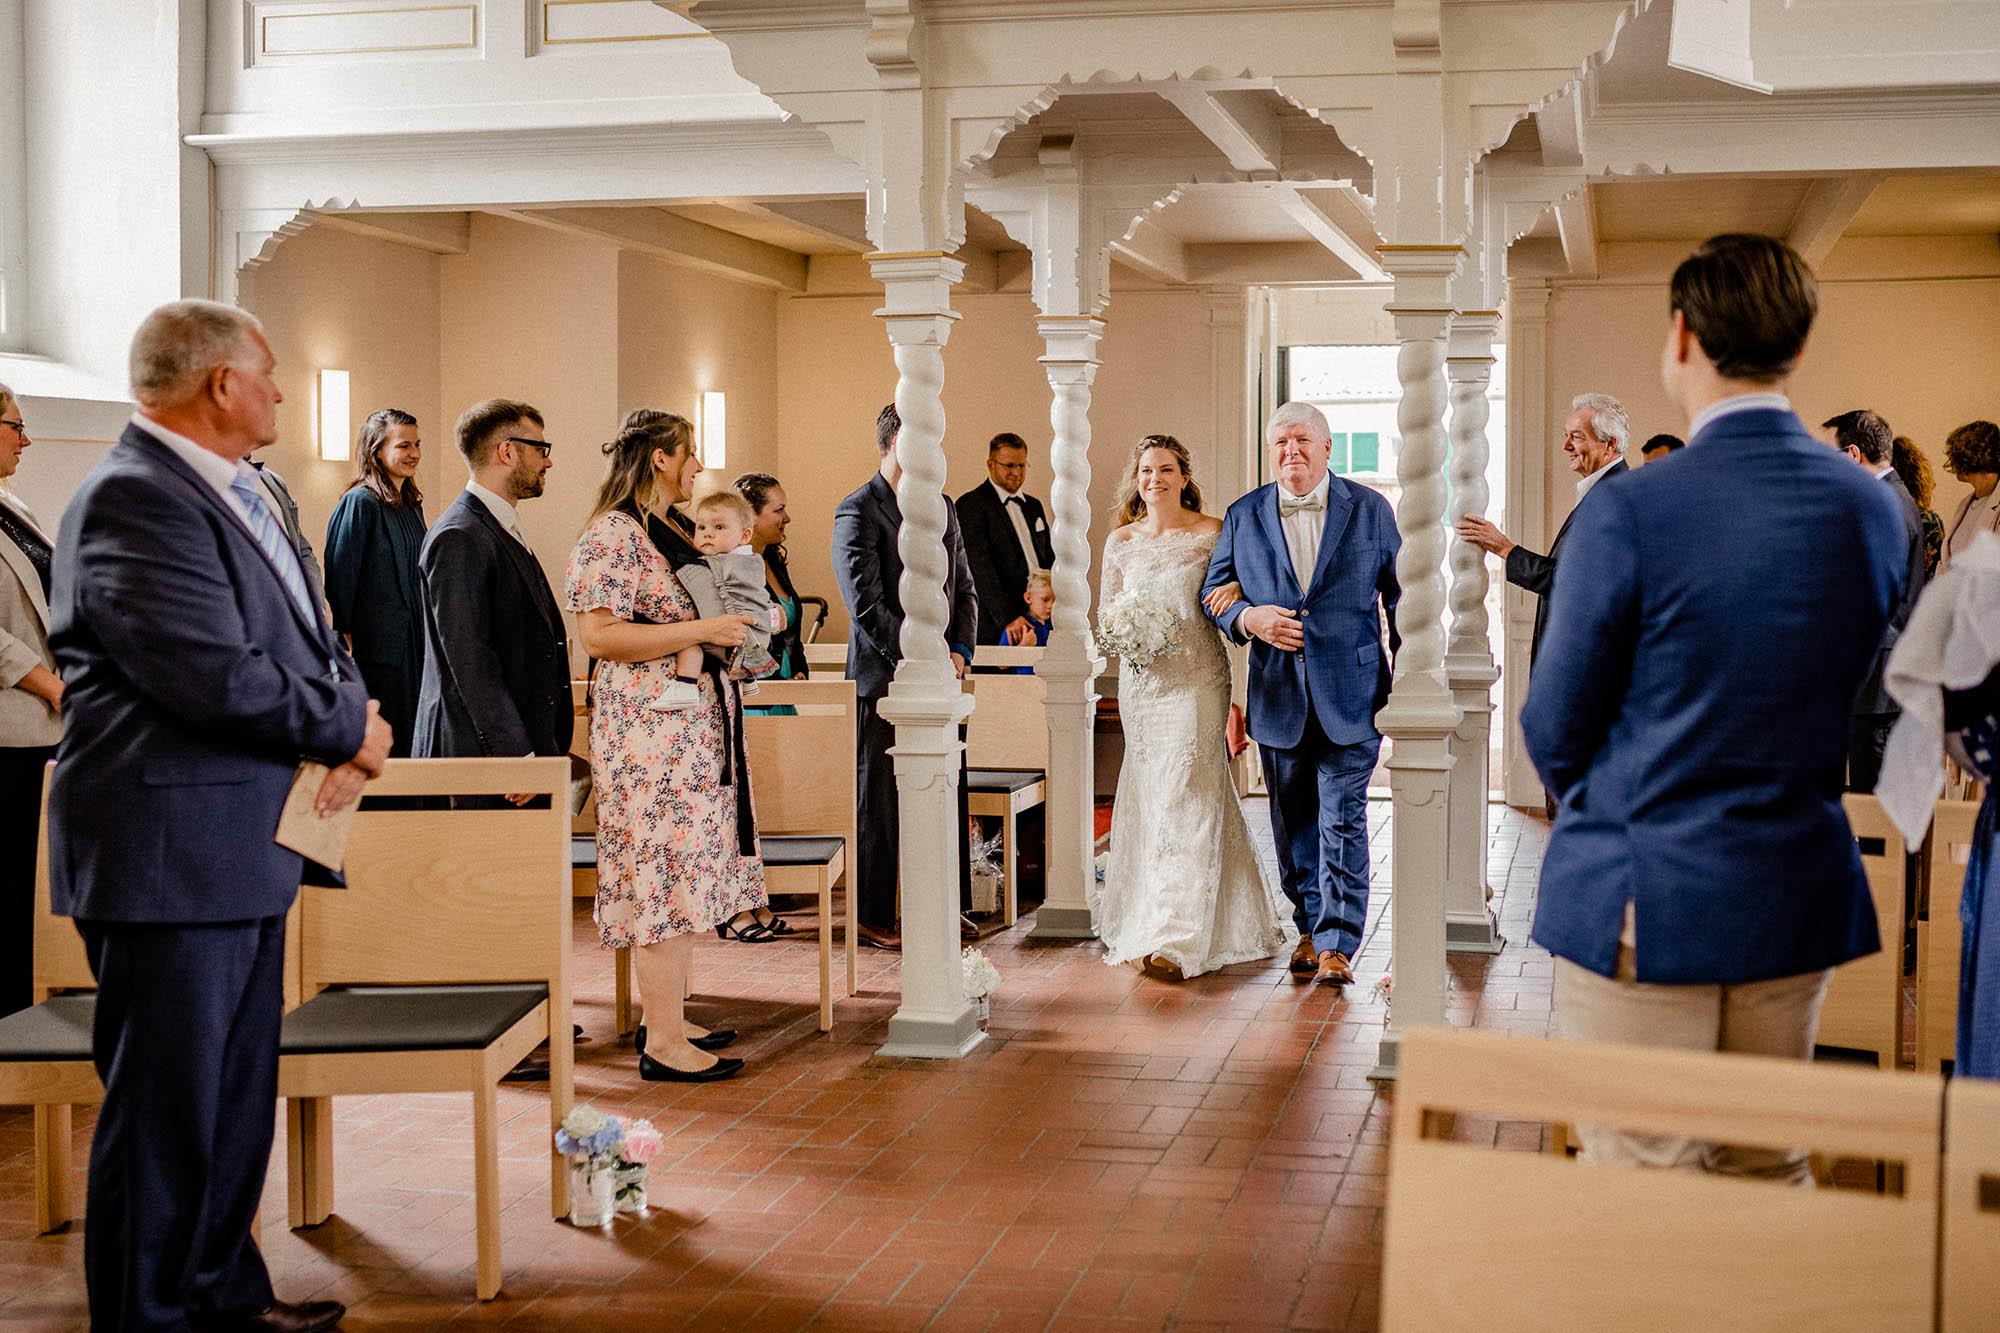 Virginia-Pech-Fotografie-Hochzeitsfotograf-Hochzeitsfotografie-Kulturscheune-Rangsdorf-Berlin-Anika-Nico-32